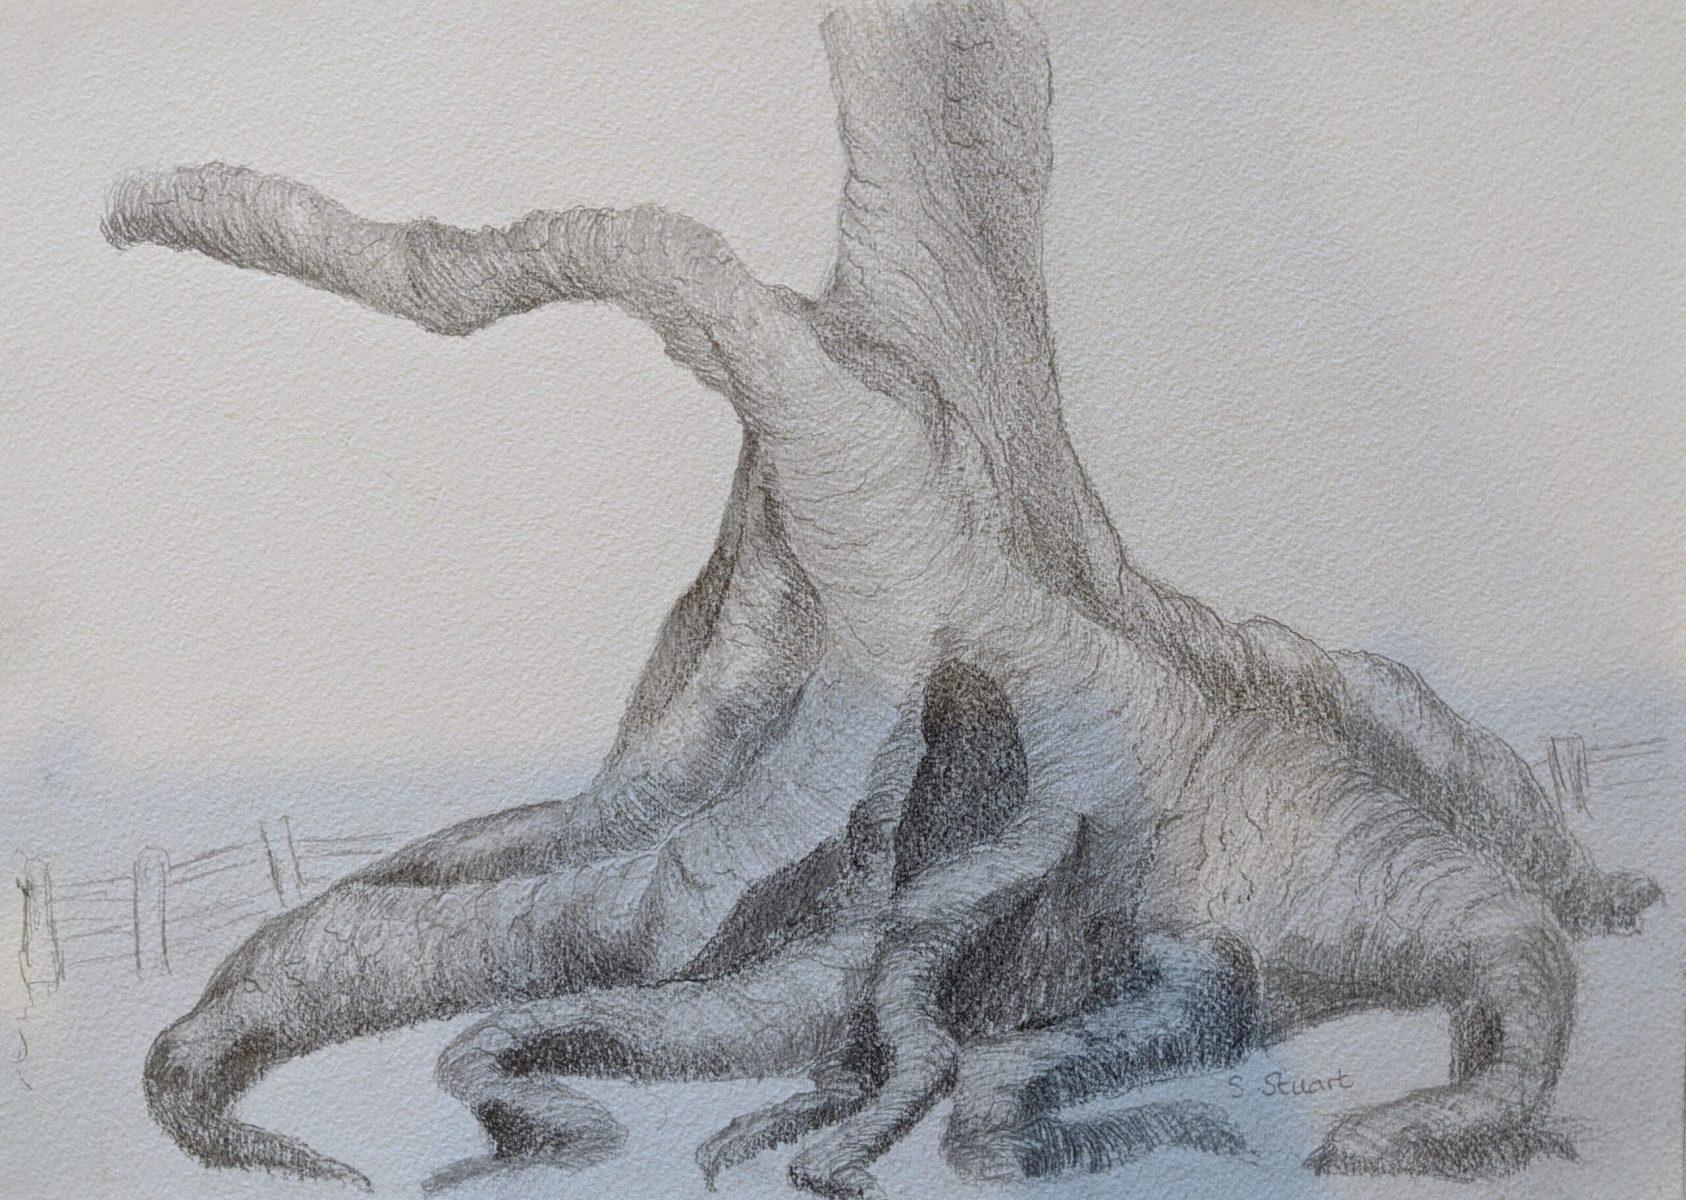 Sheryl Stuart - Nofolk Island